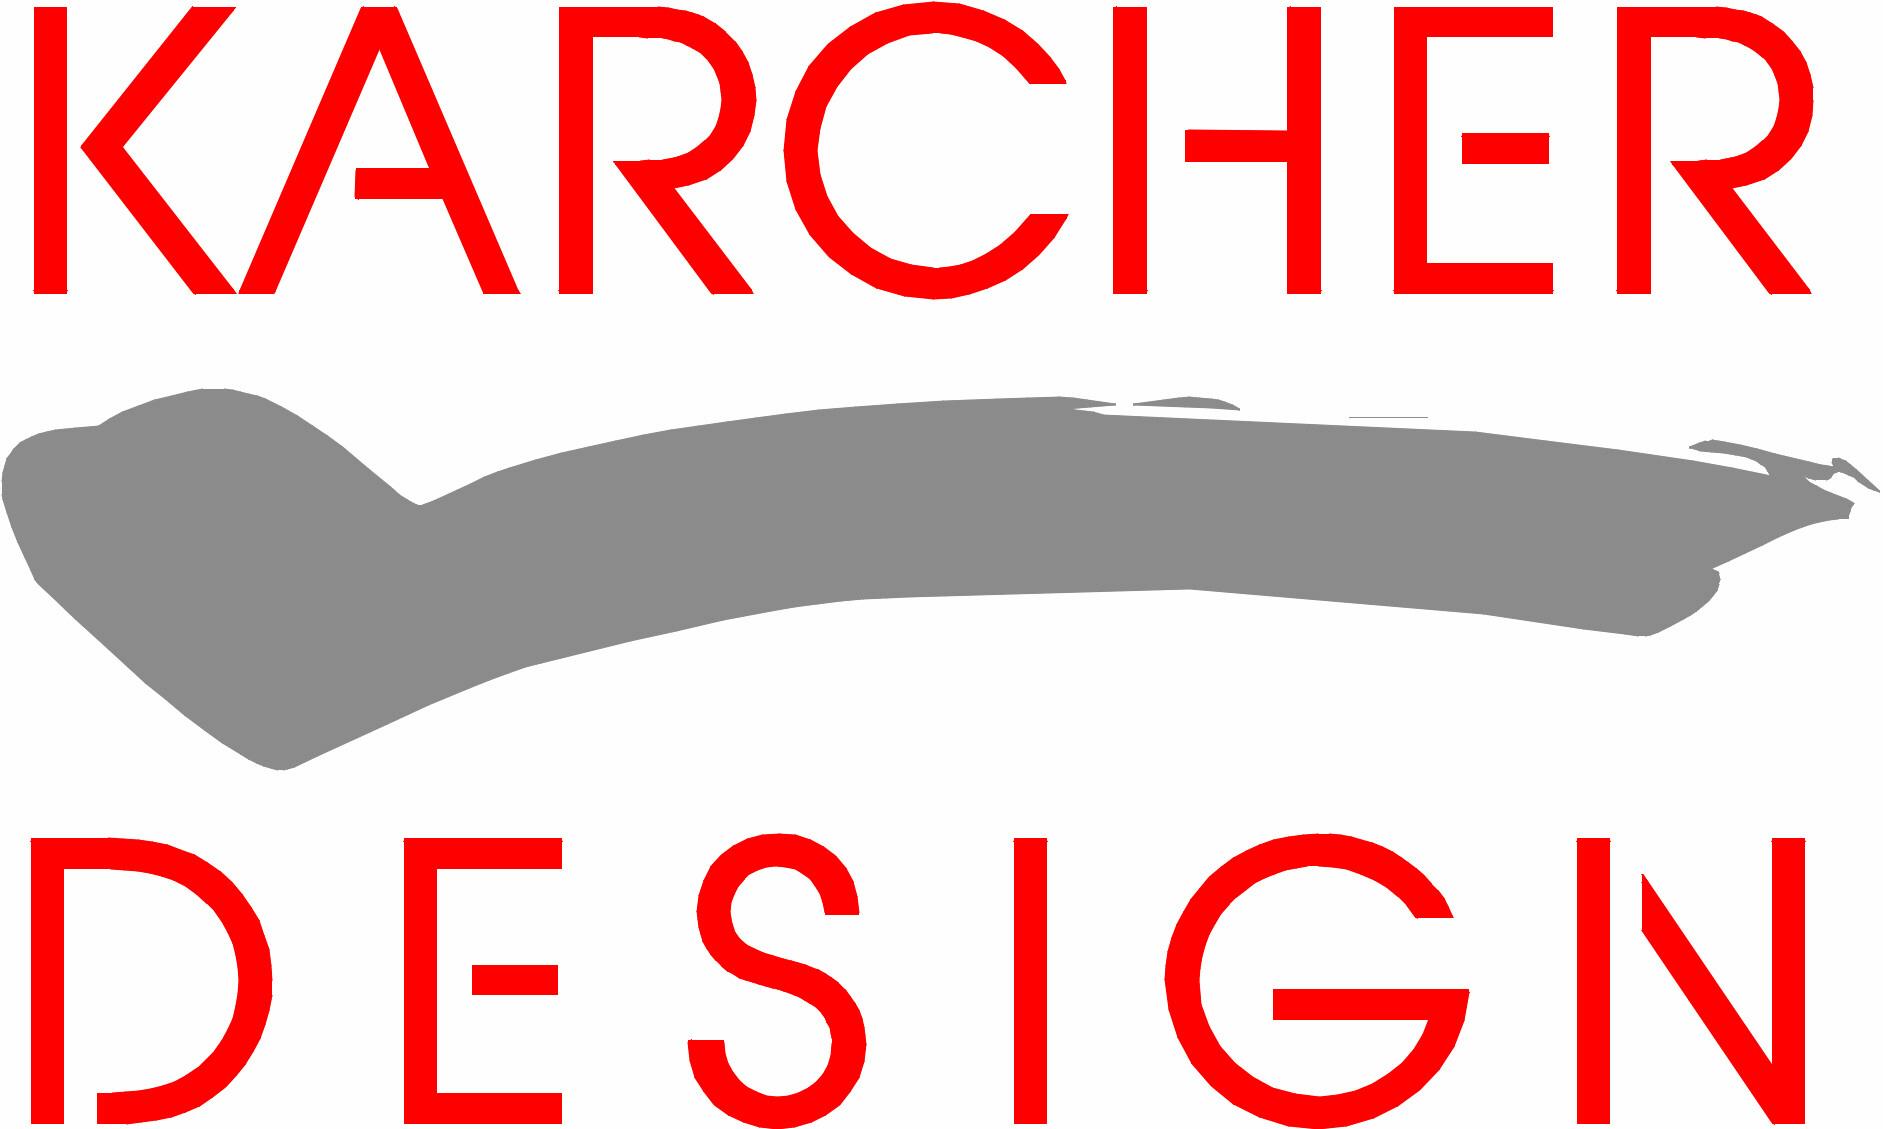 free standing karcher door stop solid stainless steel. Black Bedroom Furniture Sets. Home Design Ideas